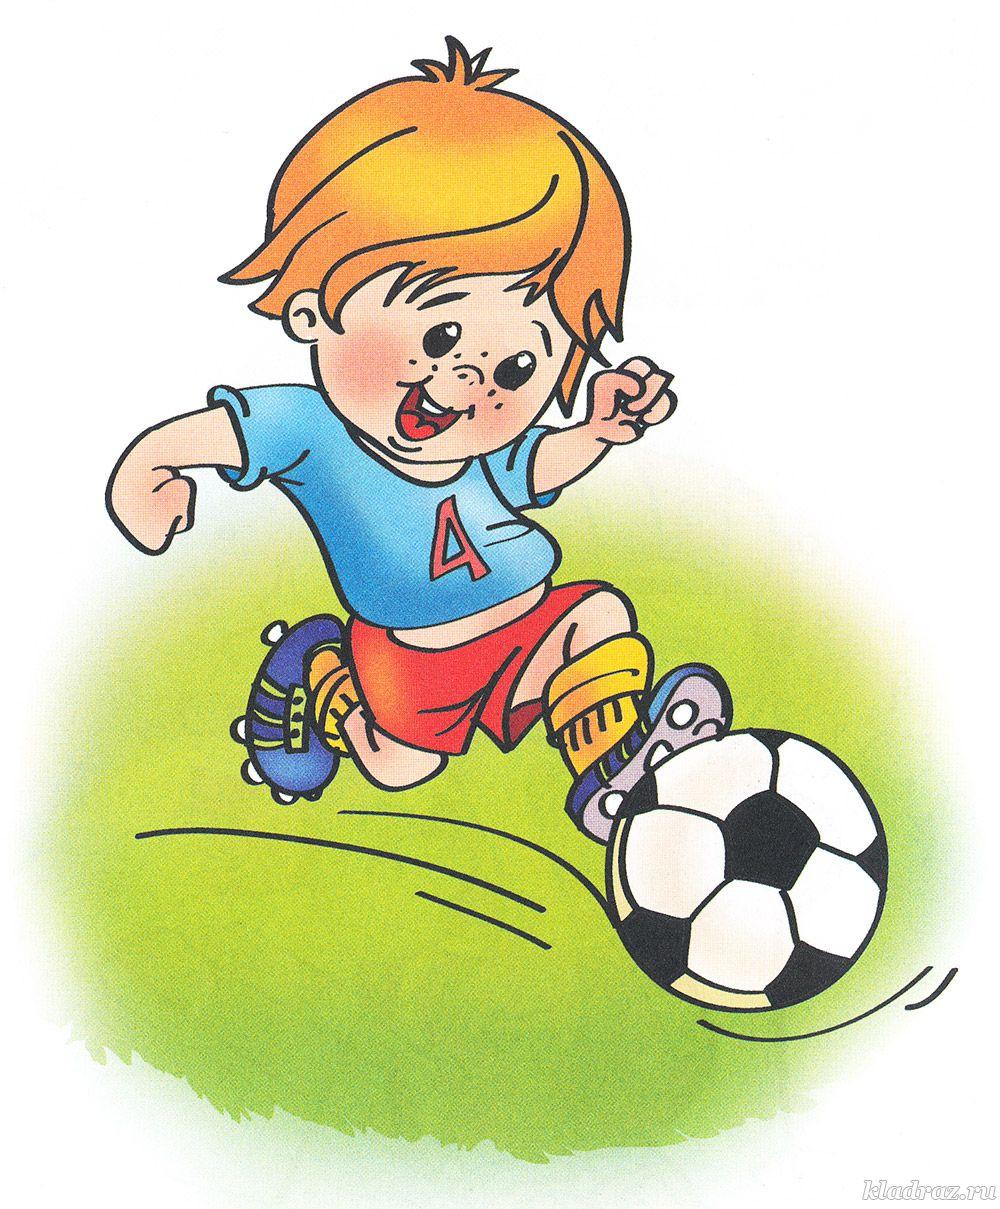 Картинки для детей. Футболист